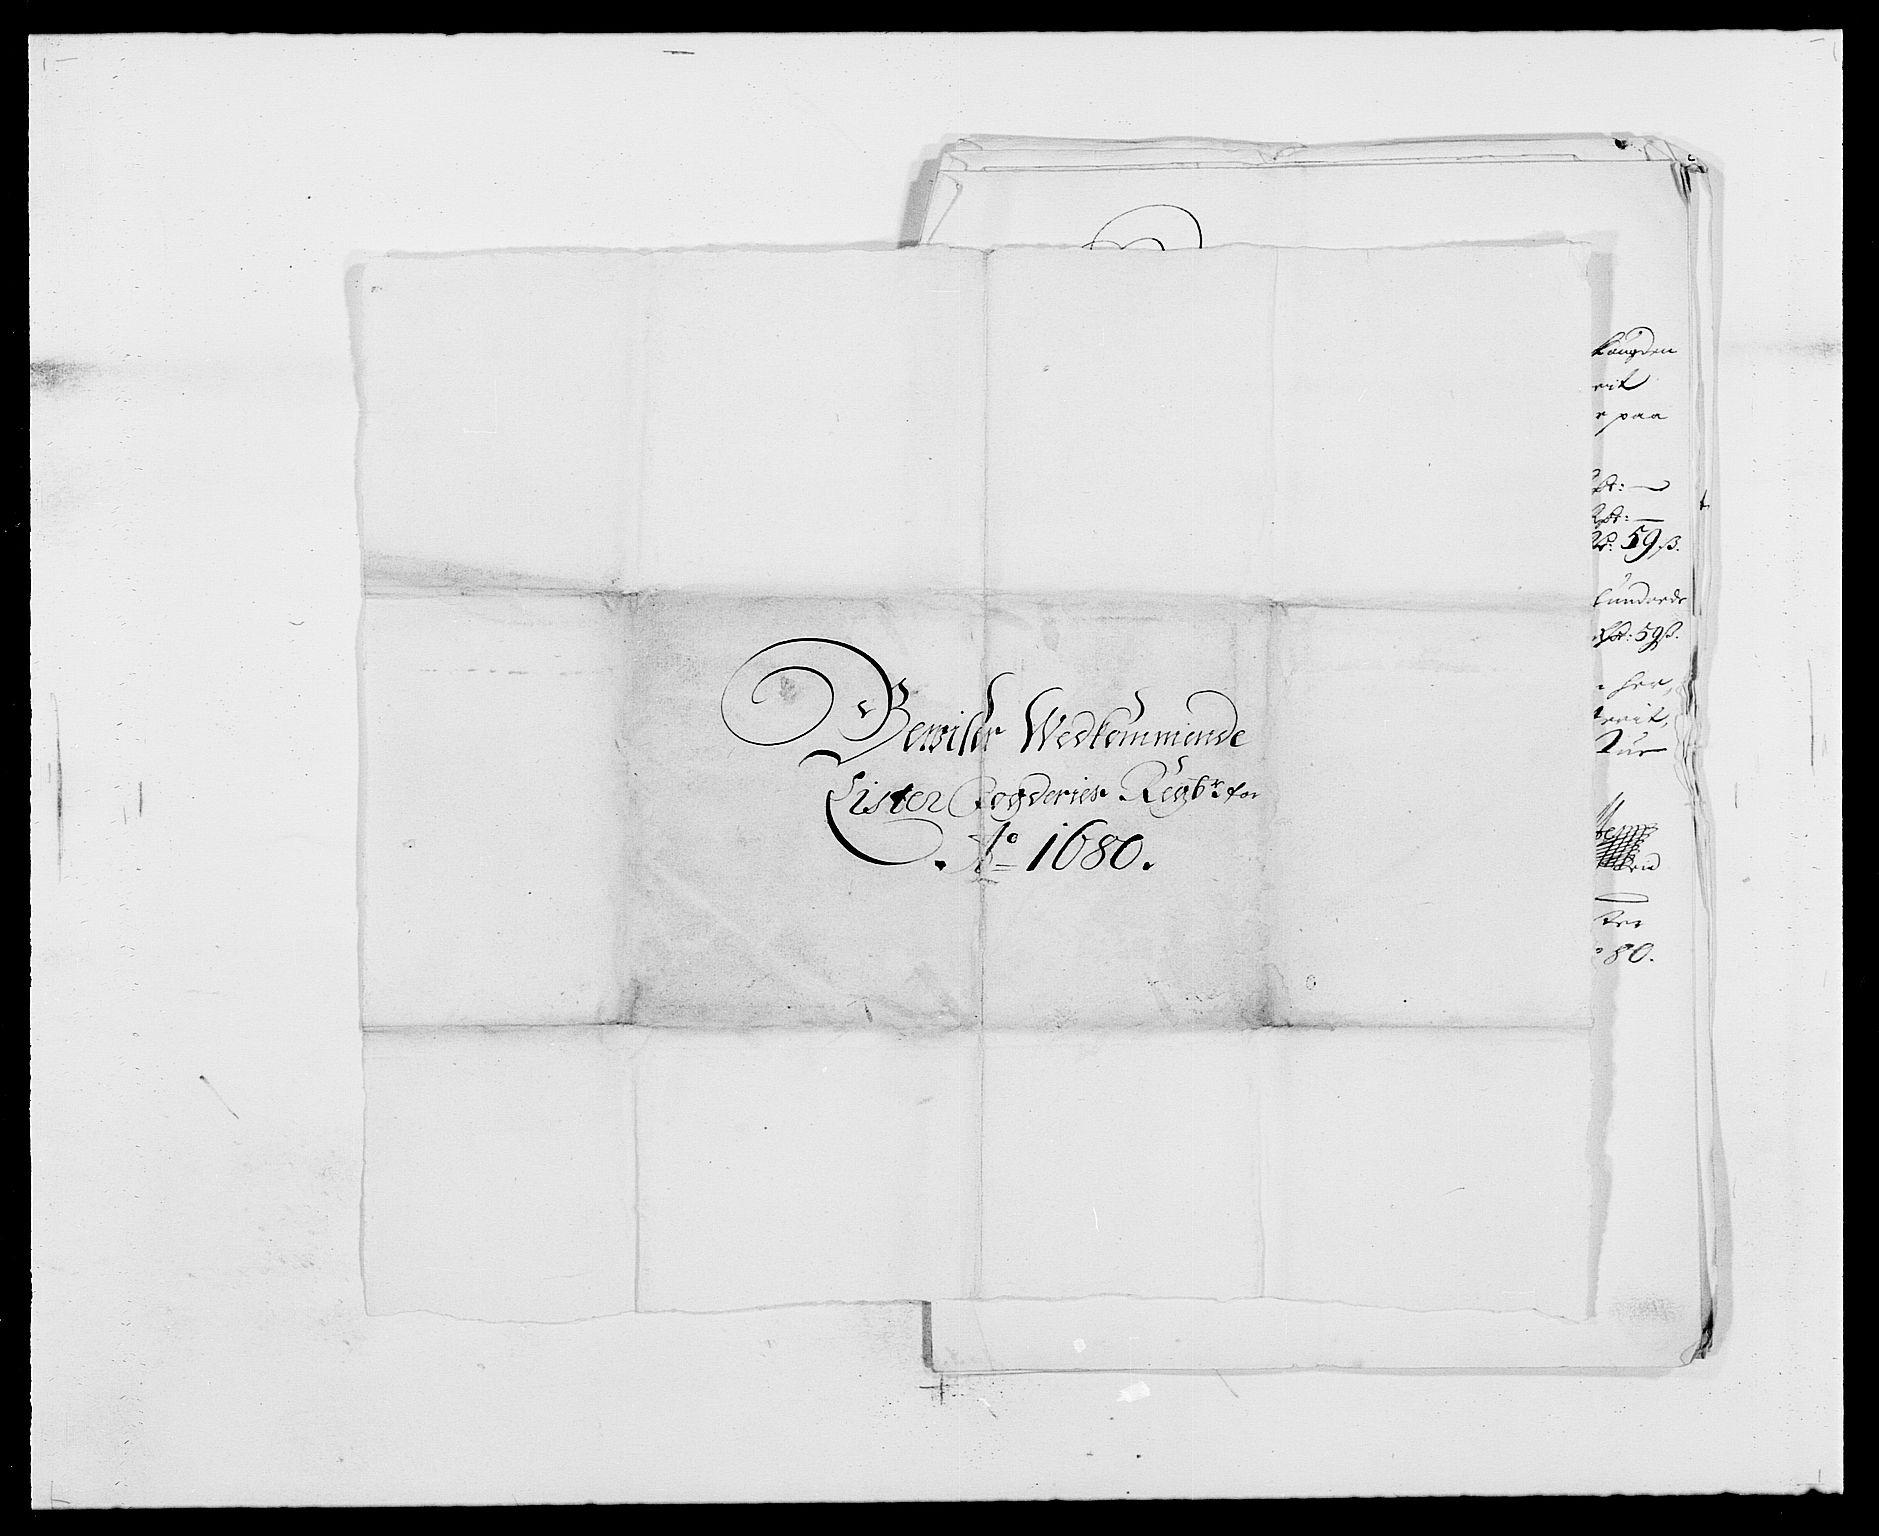 RA, Rentekammeret inntil 1814, Reviderte regnskaper, Fogderegnskap, R41/L2531: Fogderegnskap Lista, 1680-1682, s. 64